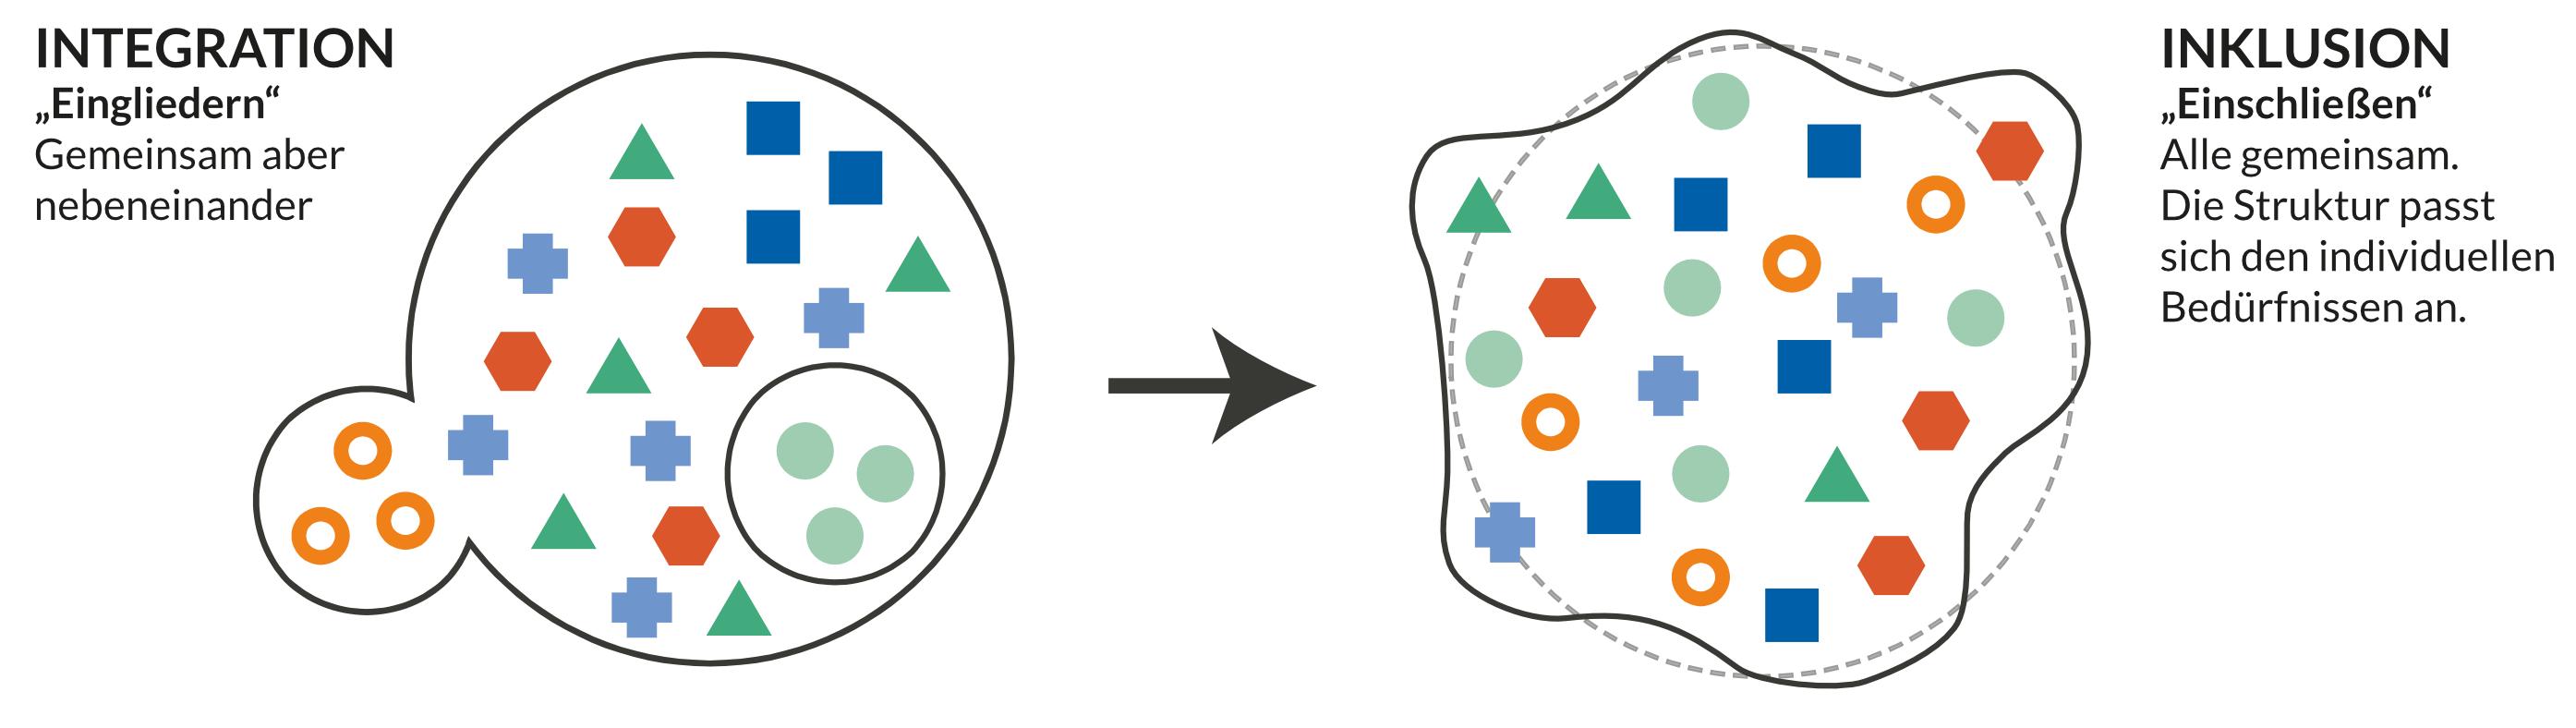 Visualisierung Integration vs. Inklusive